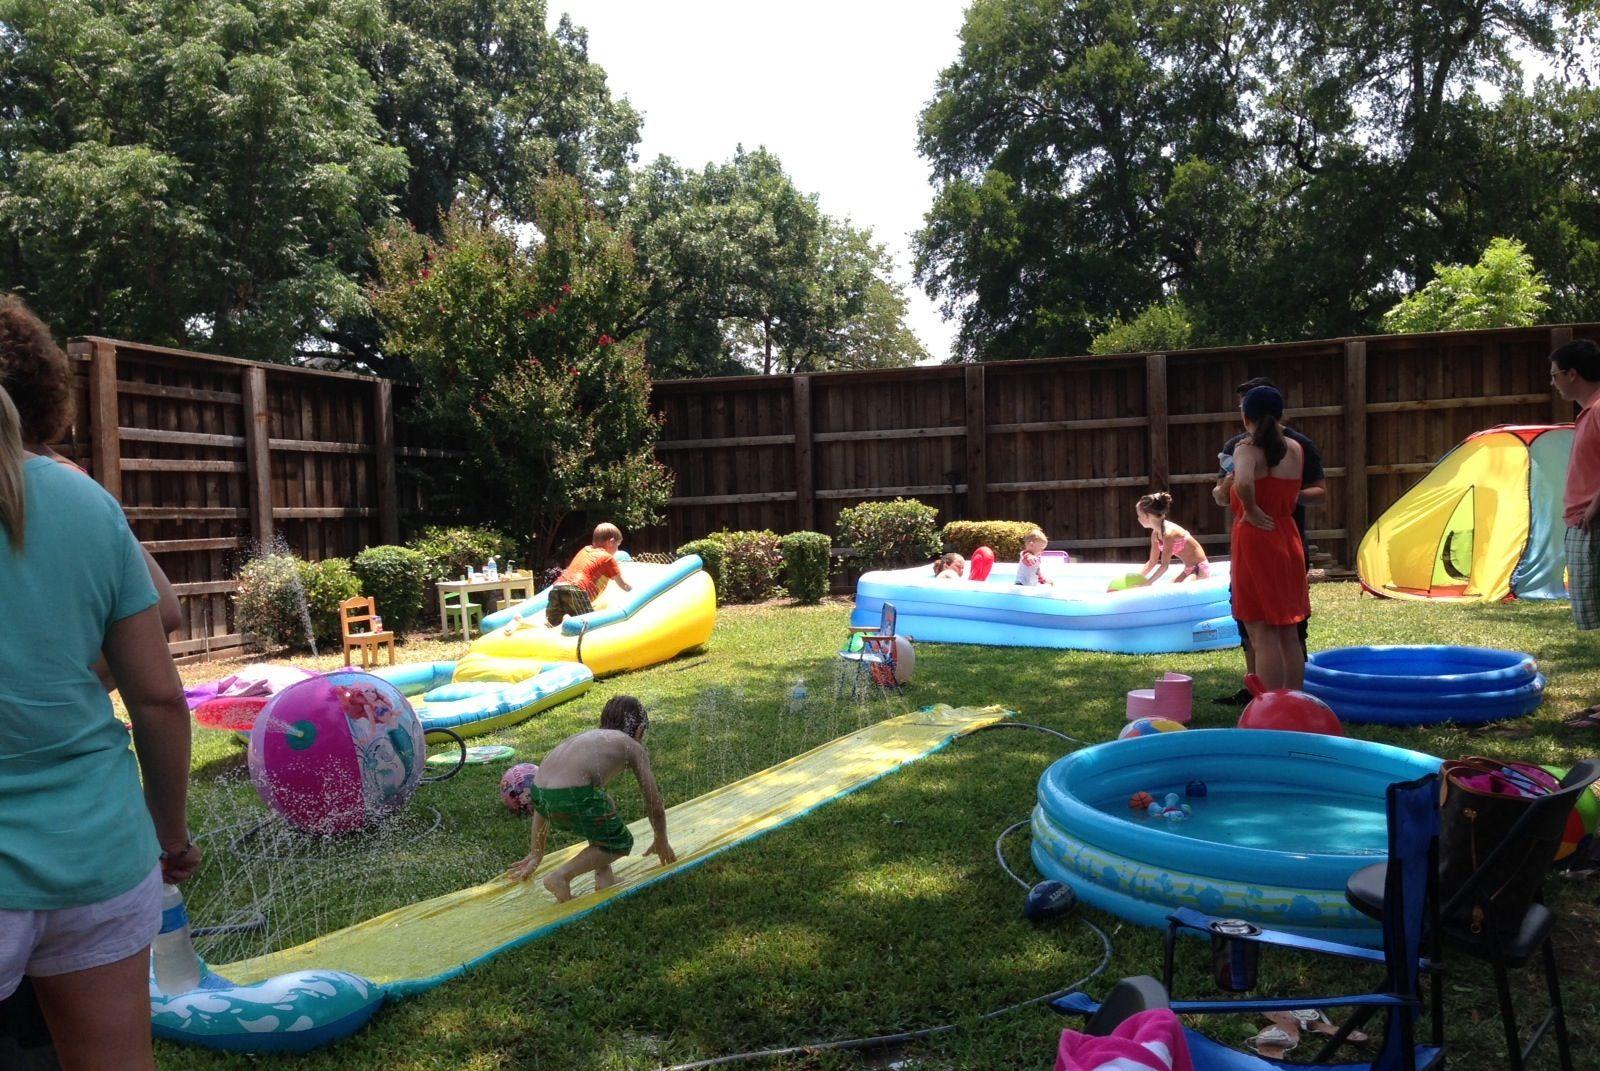 Backyard Kid Party Ideas  Backyard set up Future Birthday Party Ideas